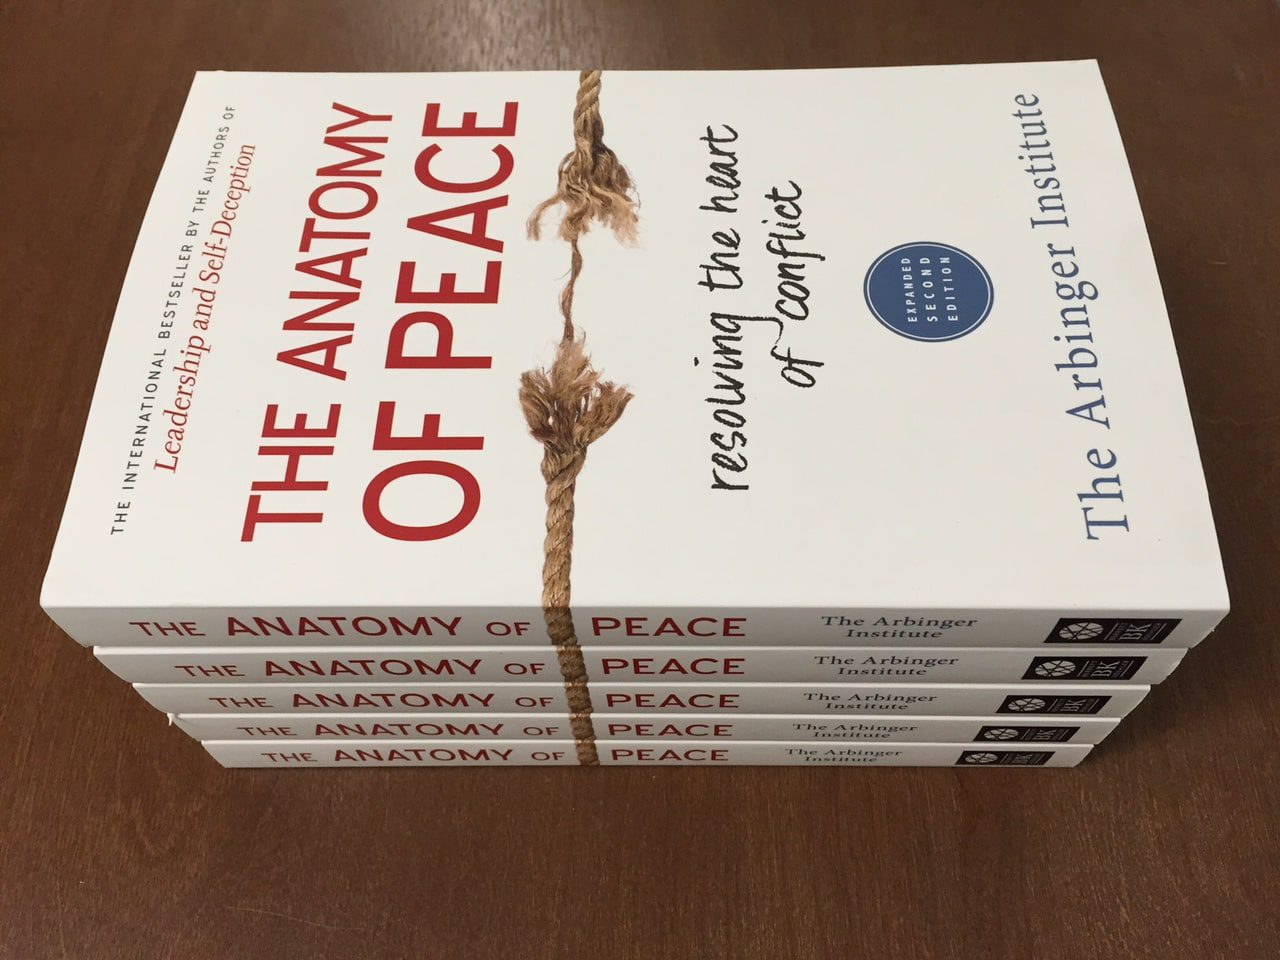 Featured on Friday: #AnatomyOfPeace Author @Arbinger